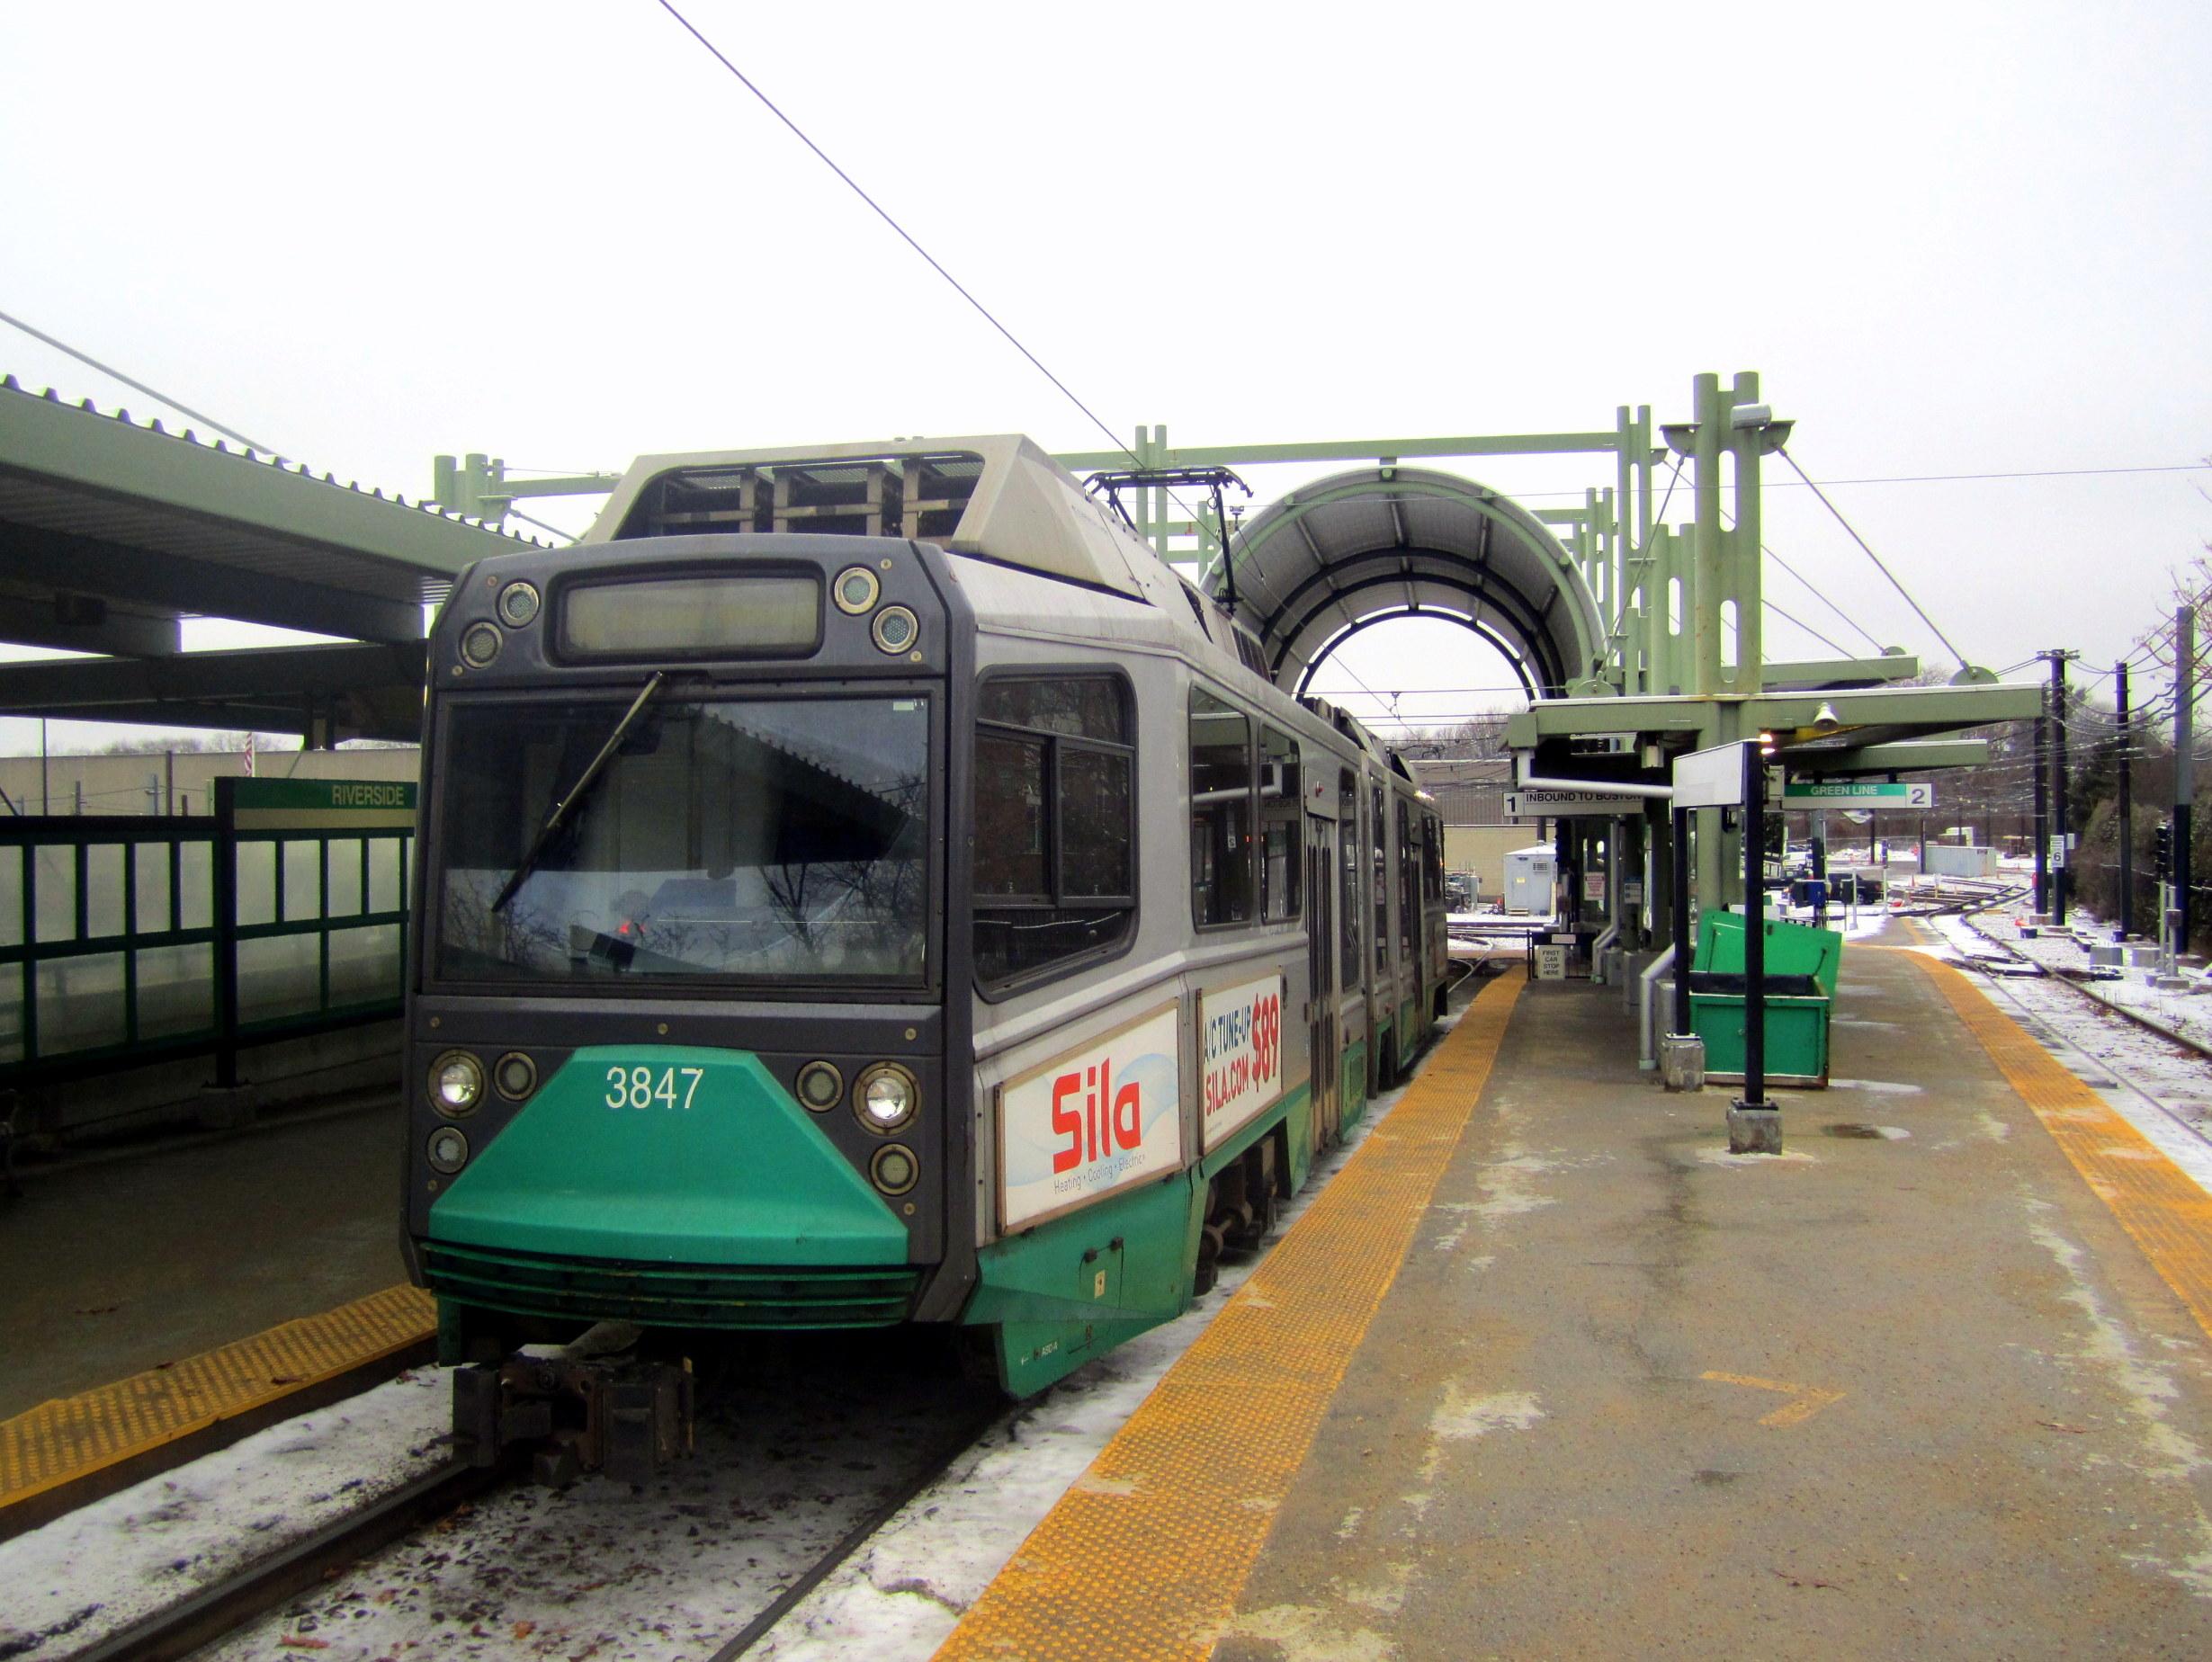 File:MBTA 3847 at Riverside, December 2017 JPG - Wikimedia Commons